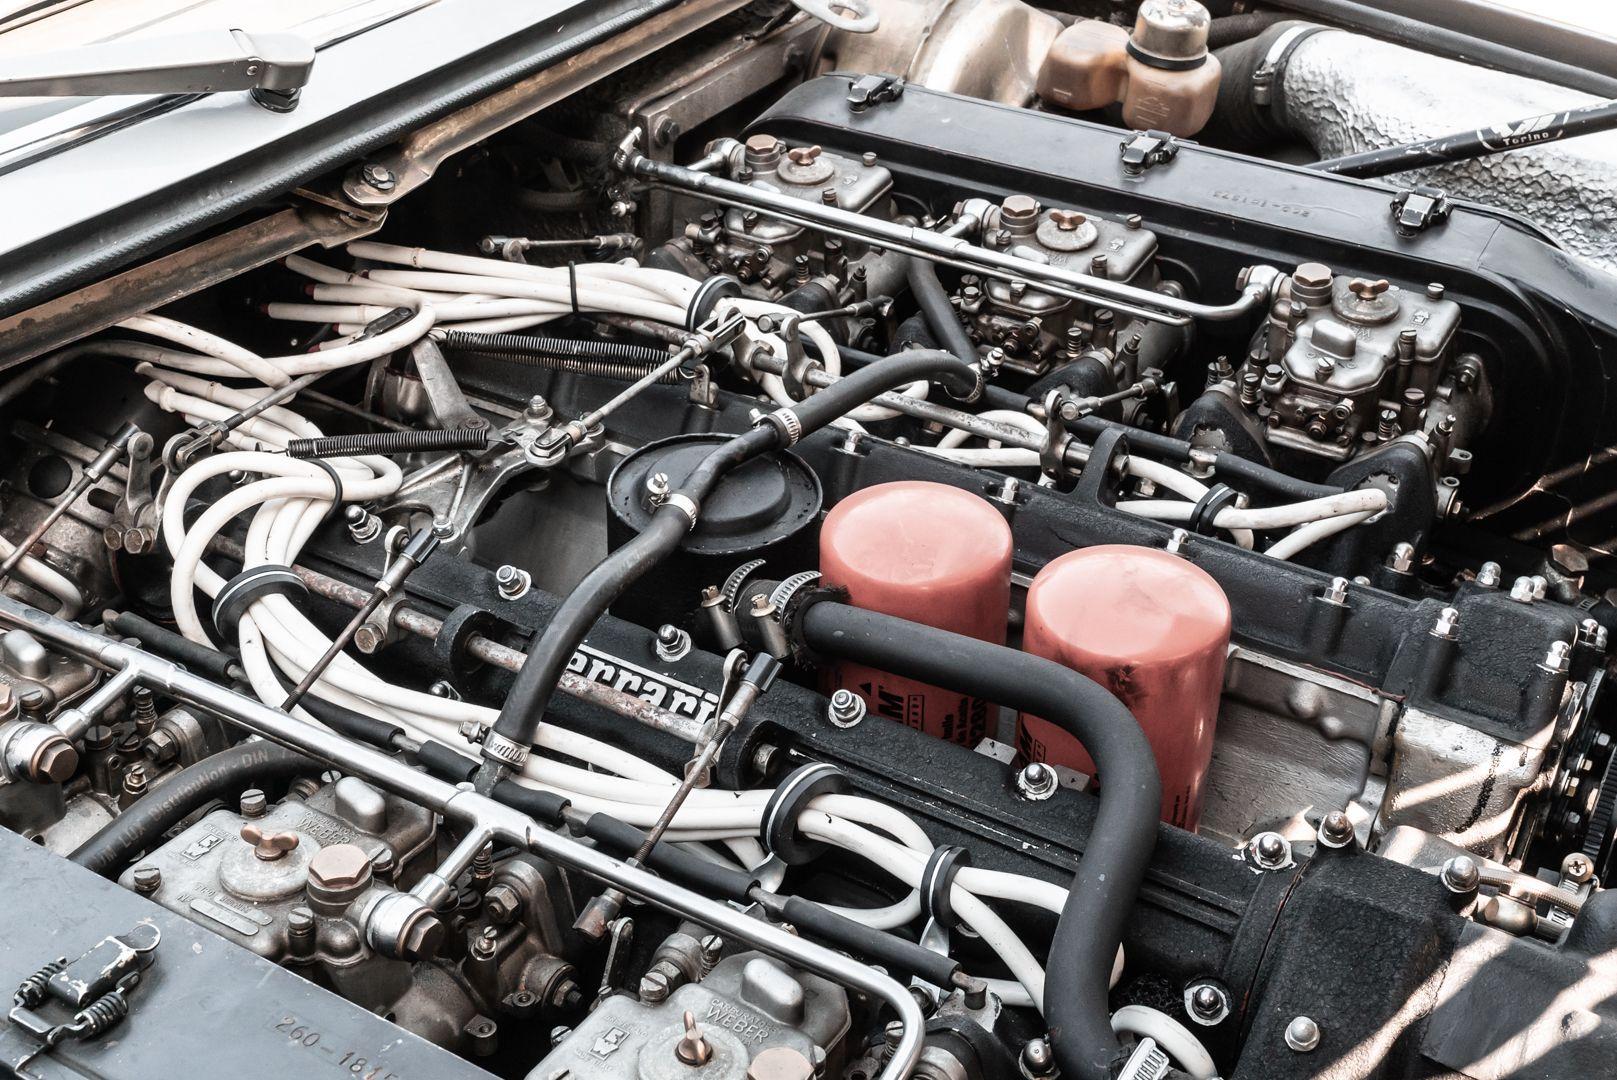 1973 Ferrari 365 GT4 2+2 81349